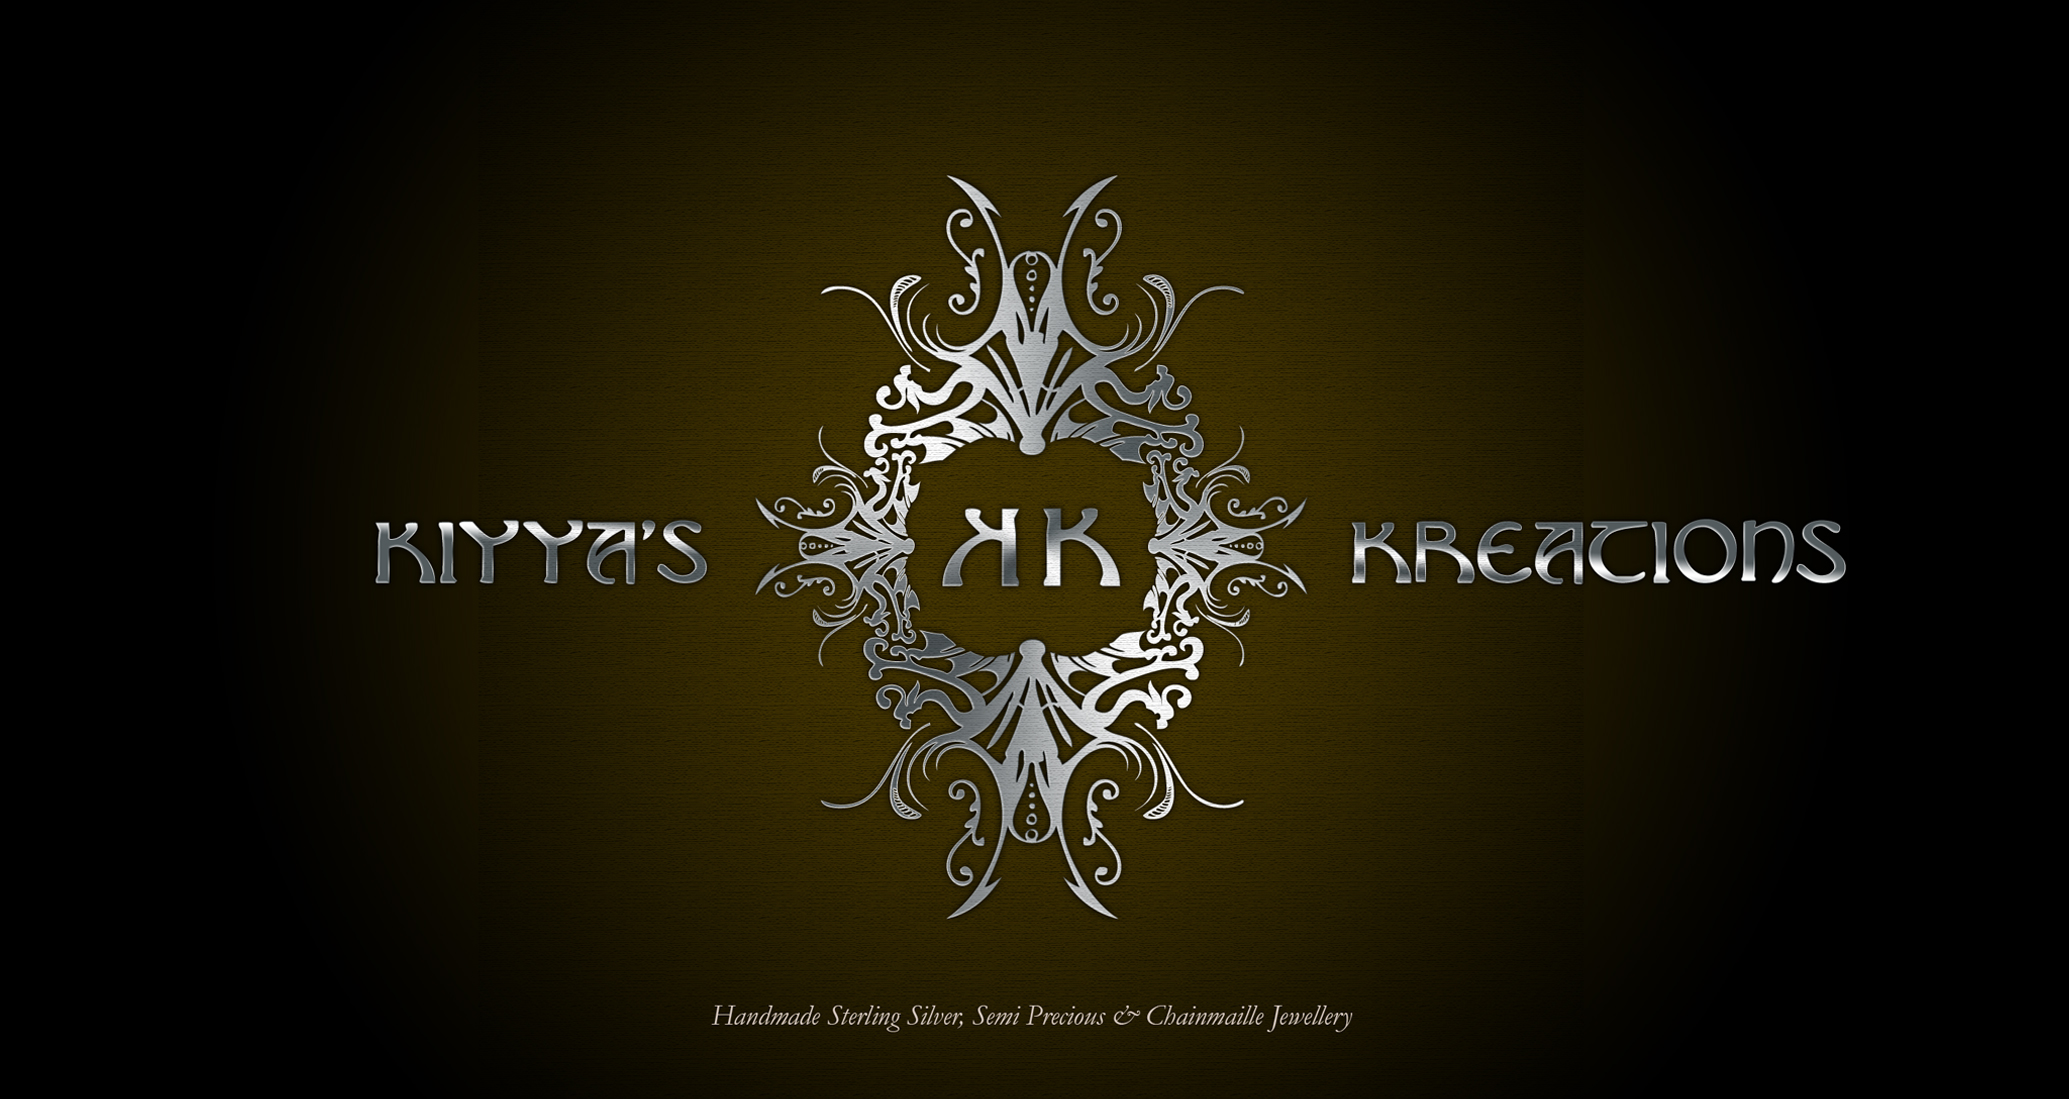 Kiyyas Kreations Logo Wallpaper